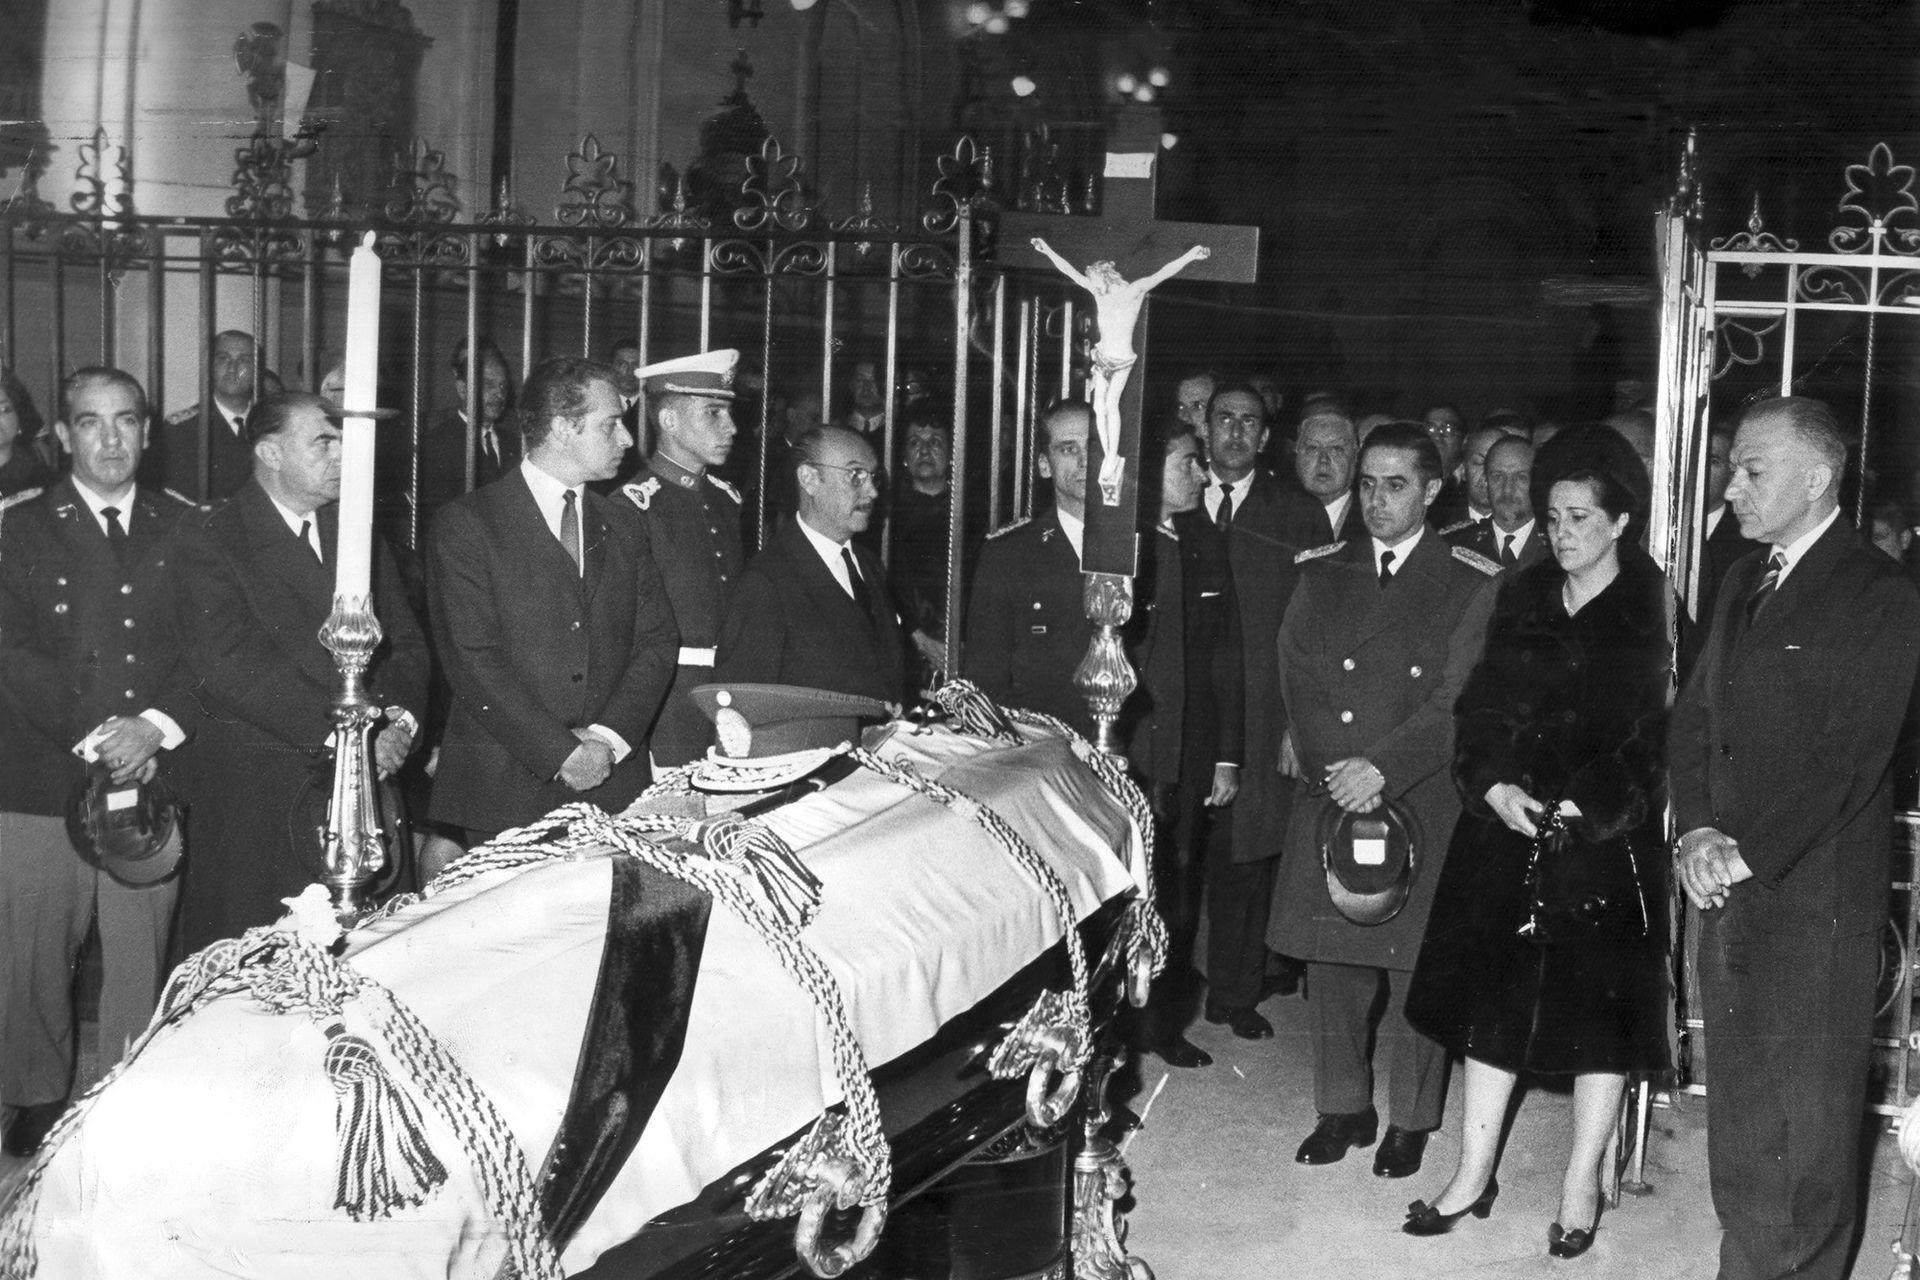 Velorio del militar Pedro Eugenio Aramburu en julio de 1970; a la derecha, Roberto Marcelo Levingston, entonces presidente.